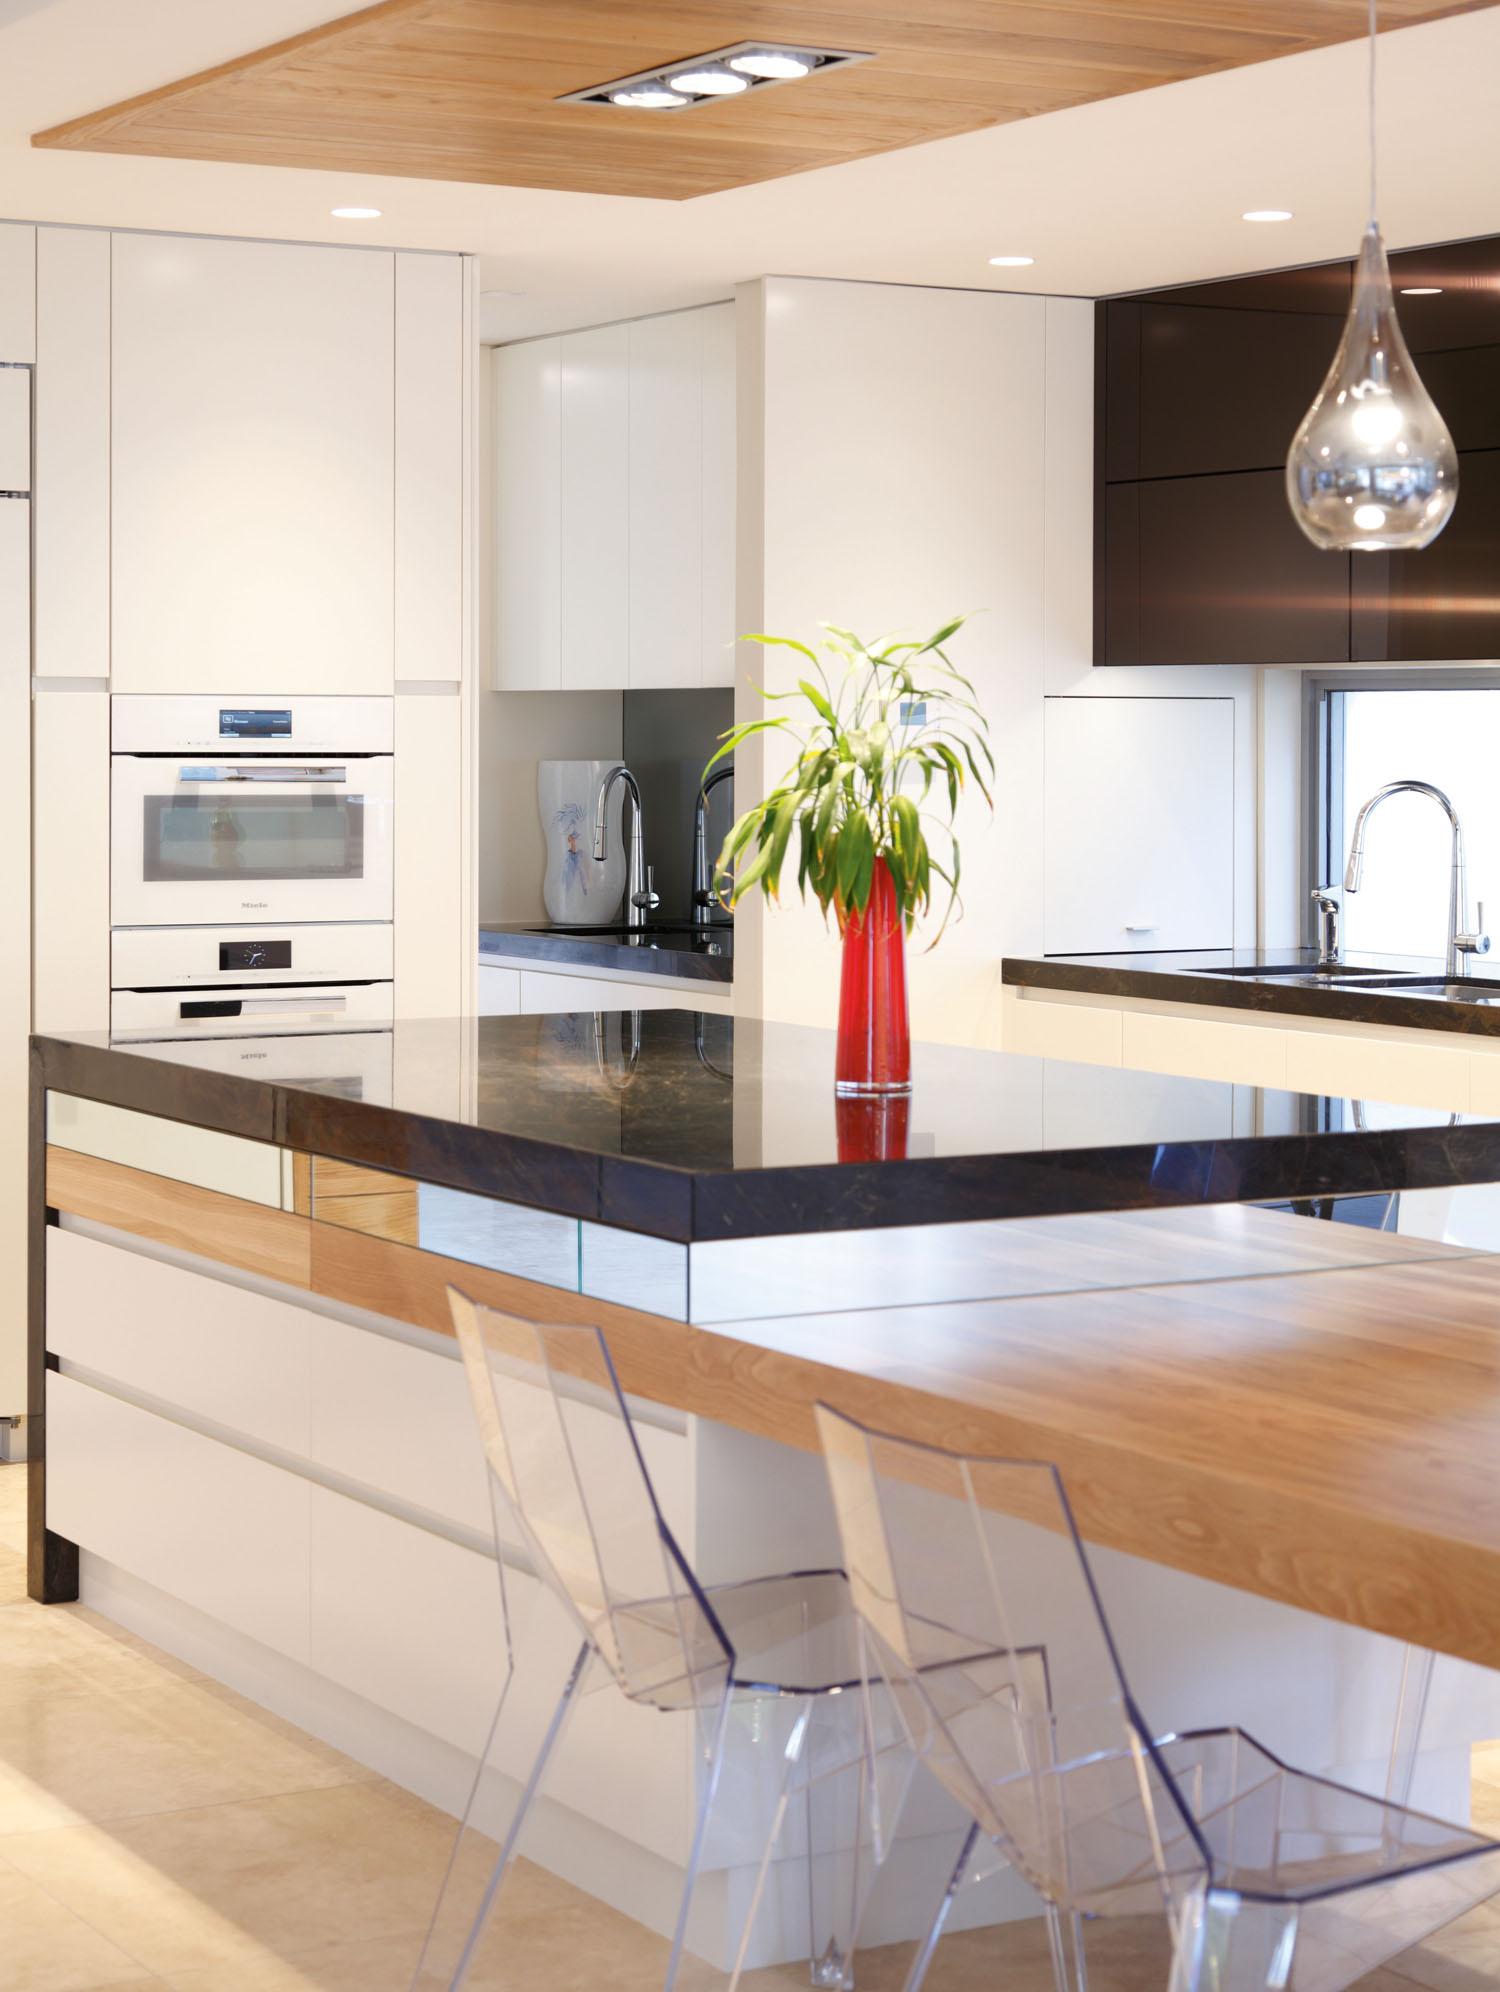 Slice of beauty: kitchen design